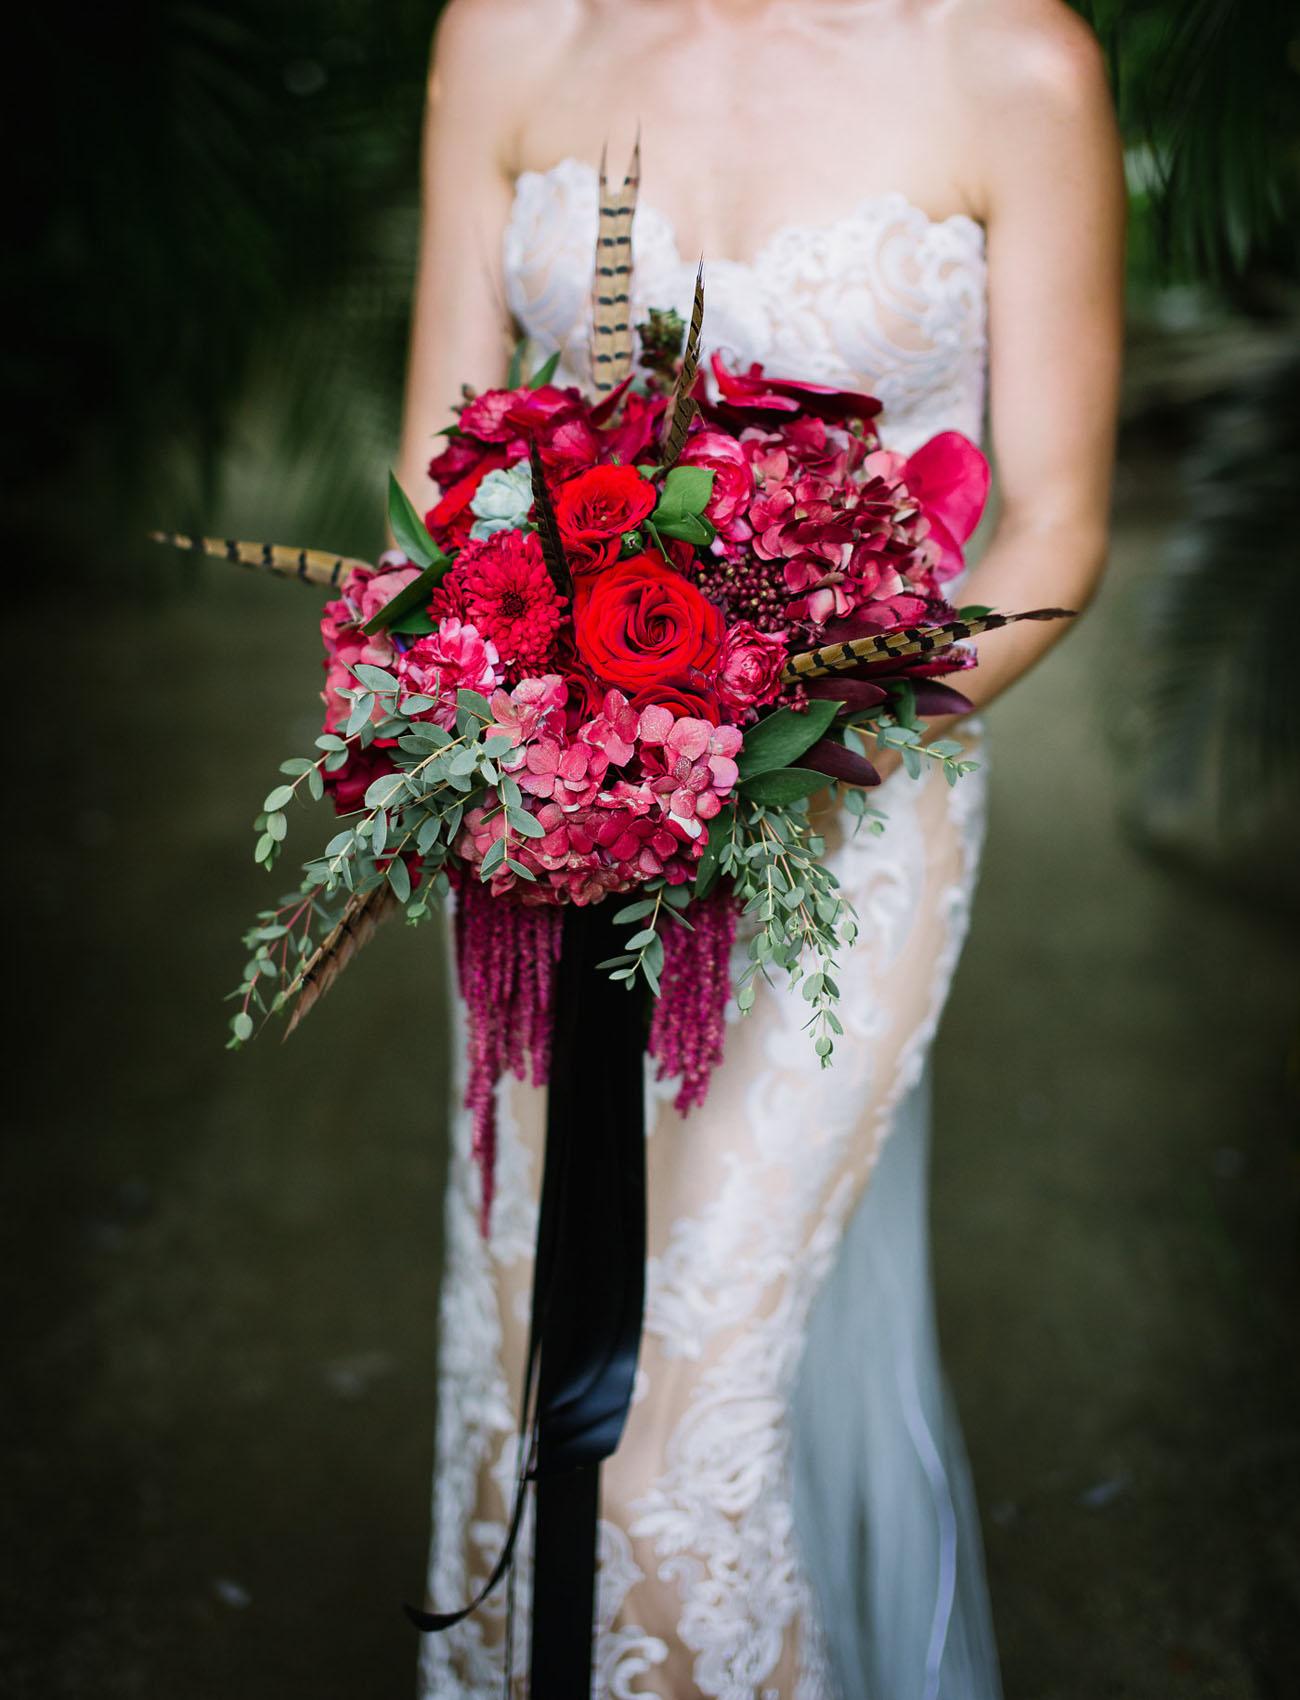 Amazing bridal bouquet